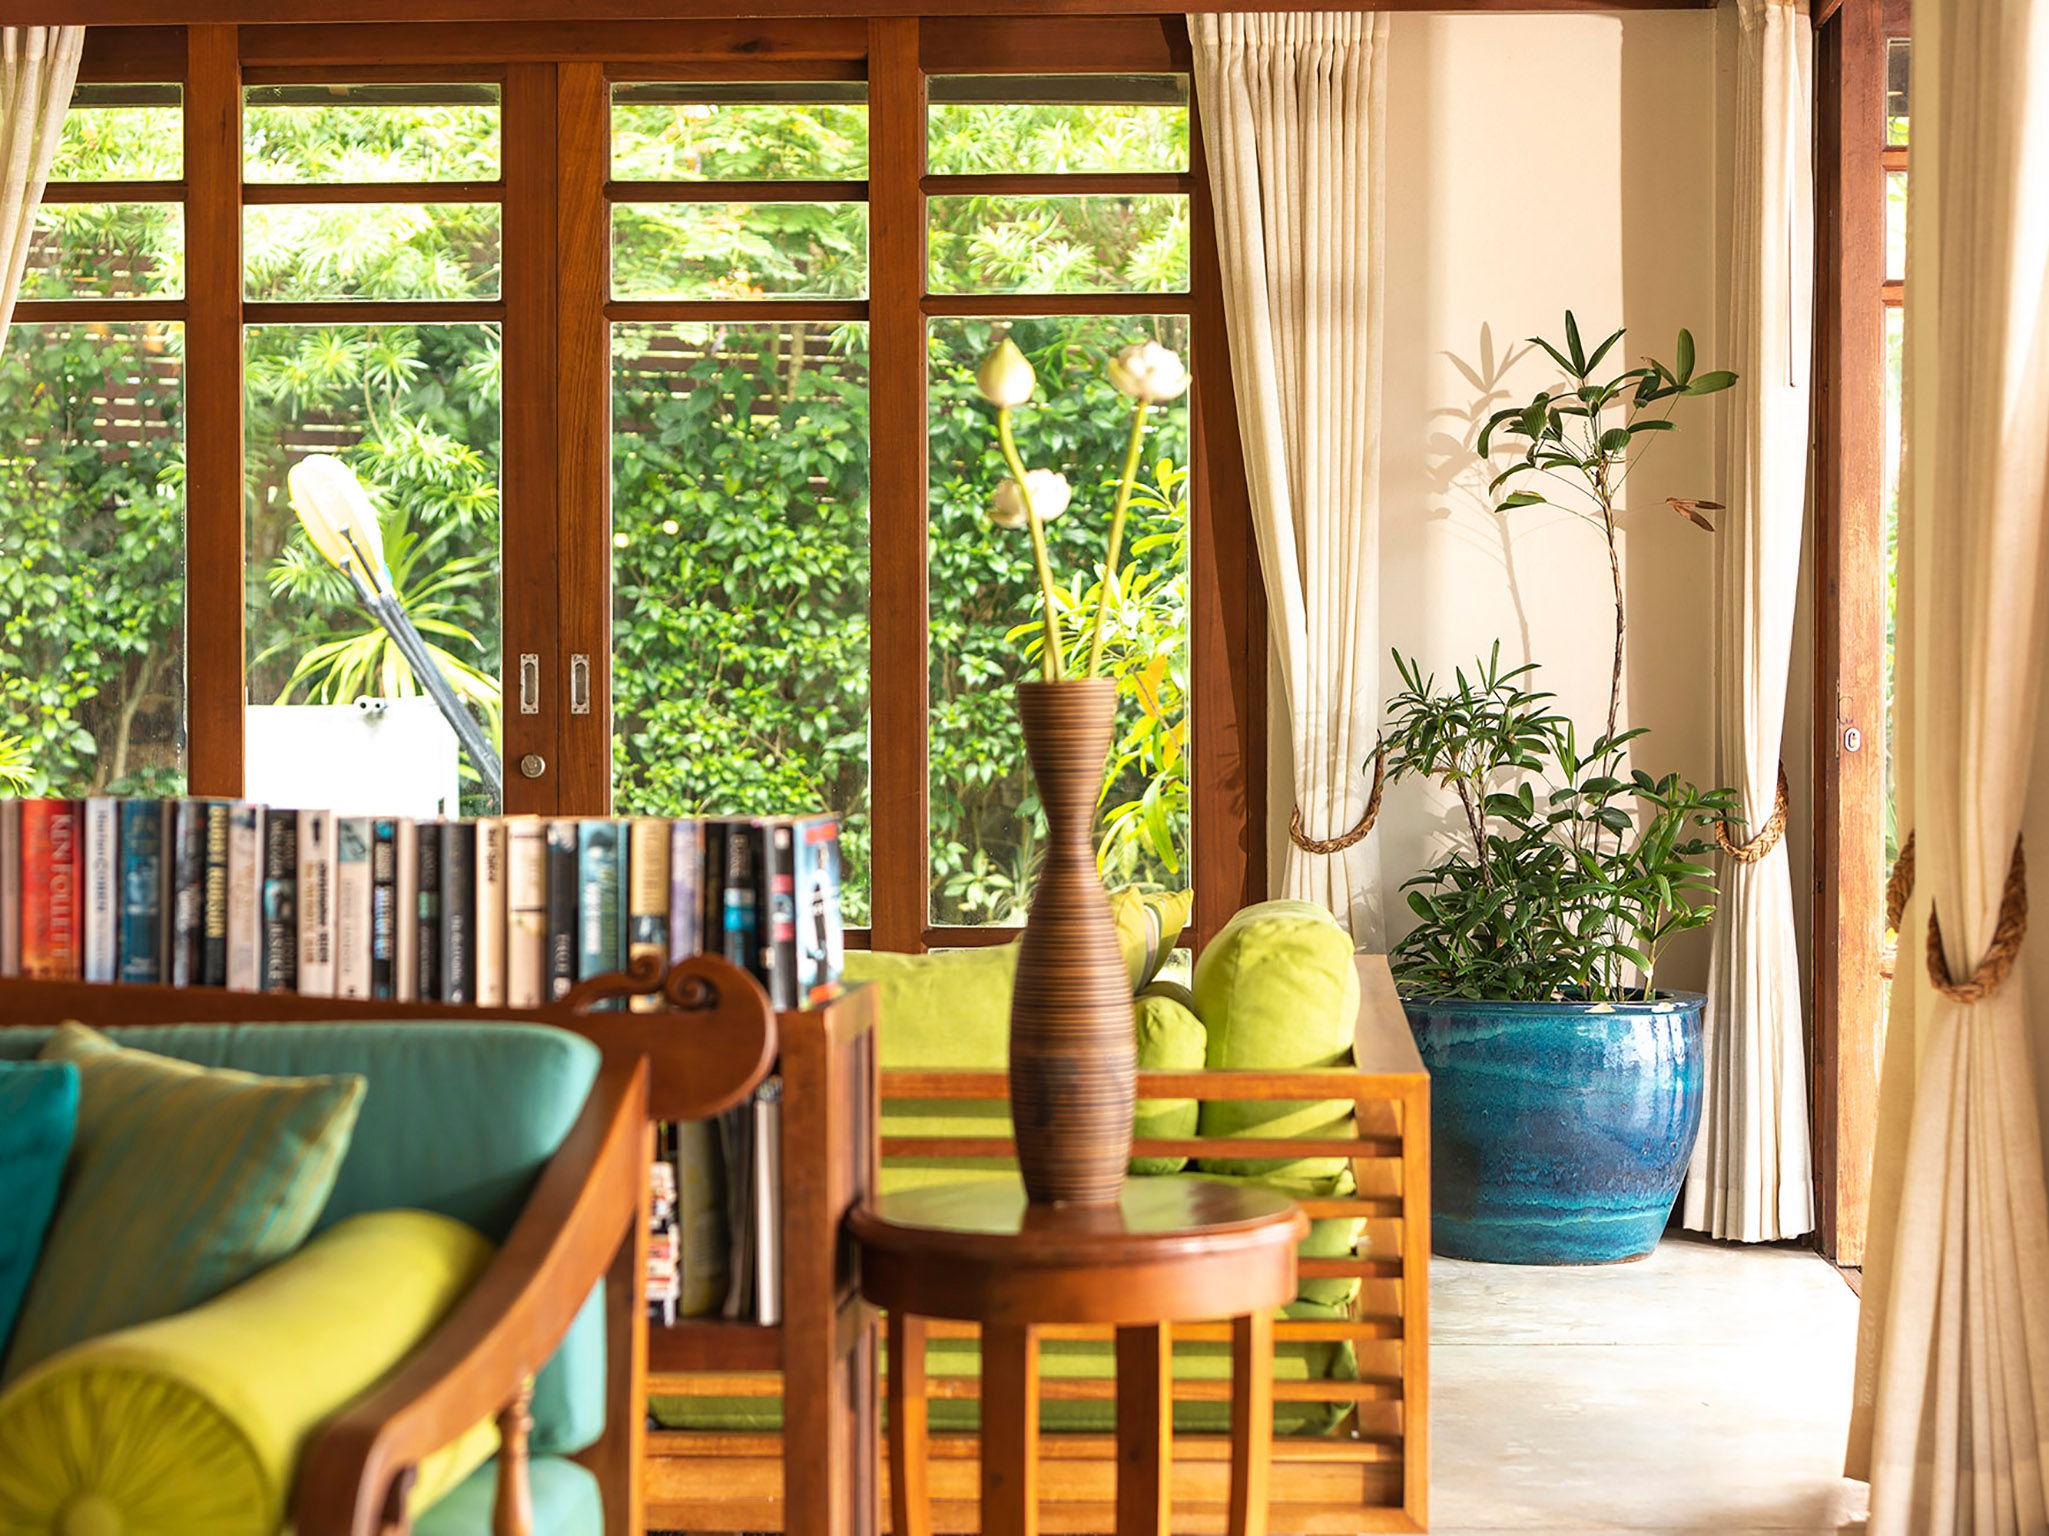 Waimarie - Living room furnitures detail